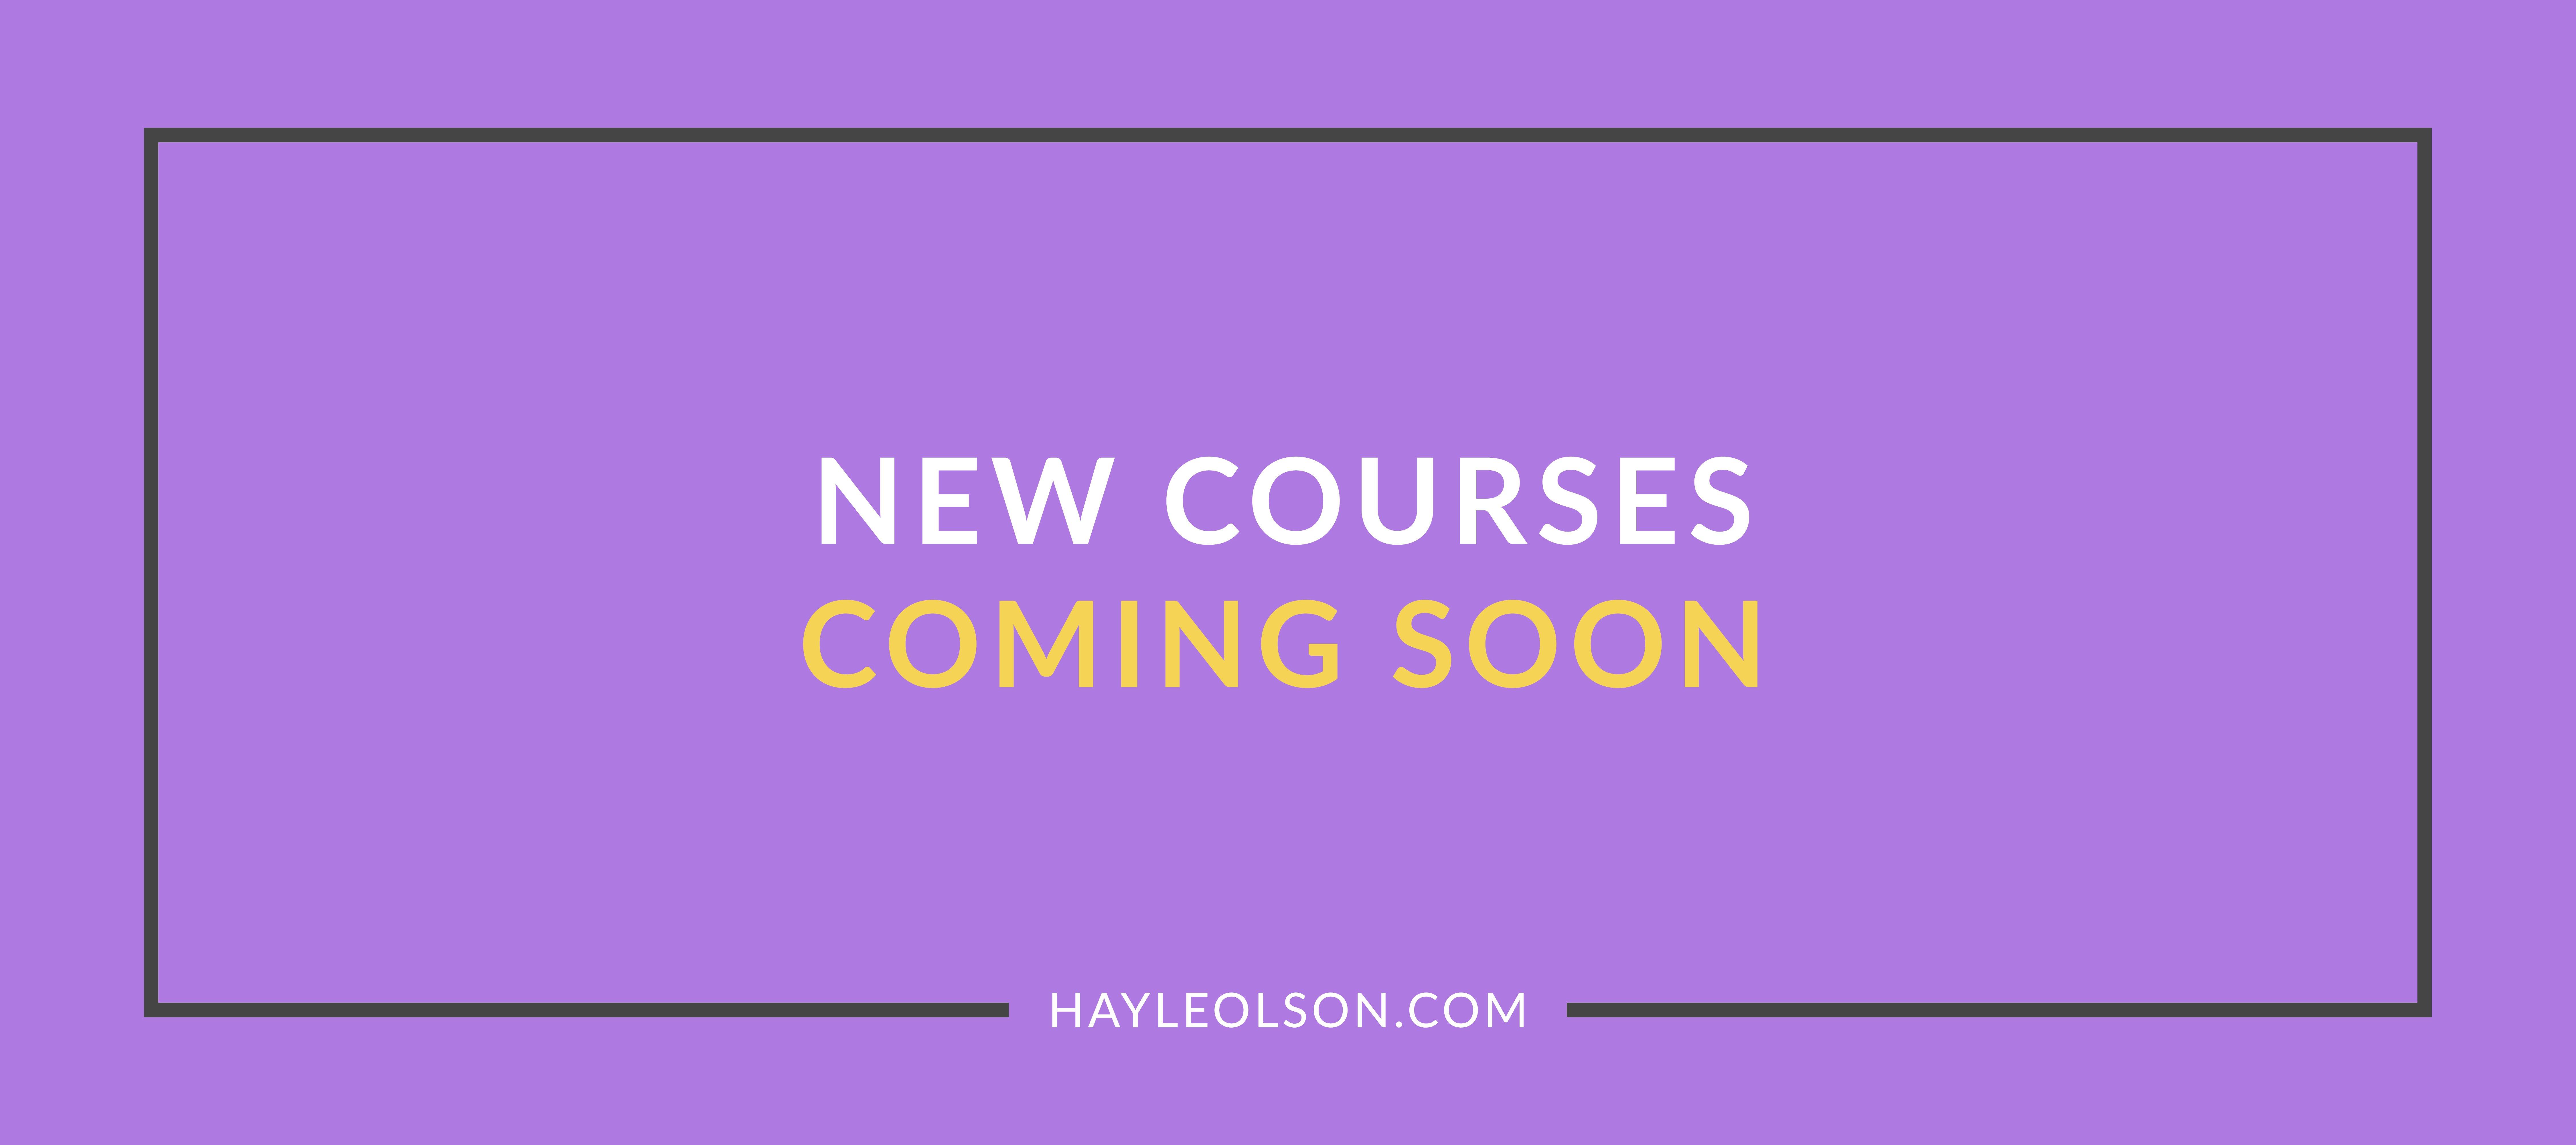 College Courses | Hayle Olson | www.hayleolson.com